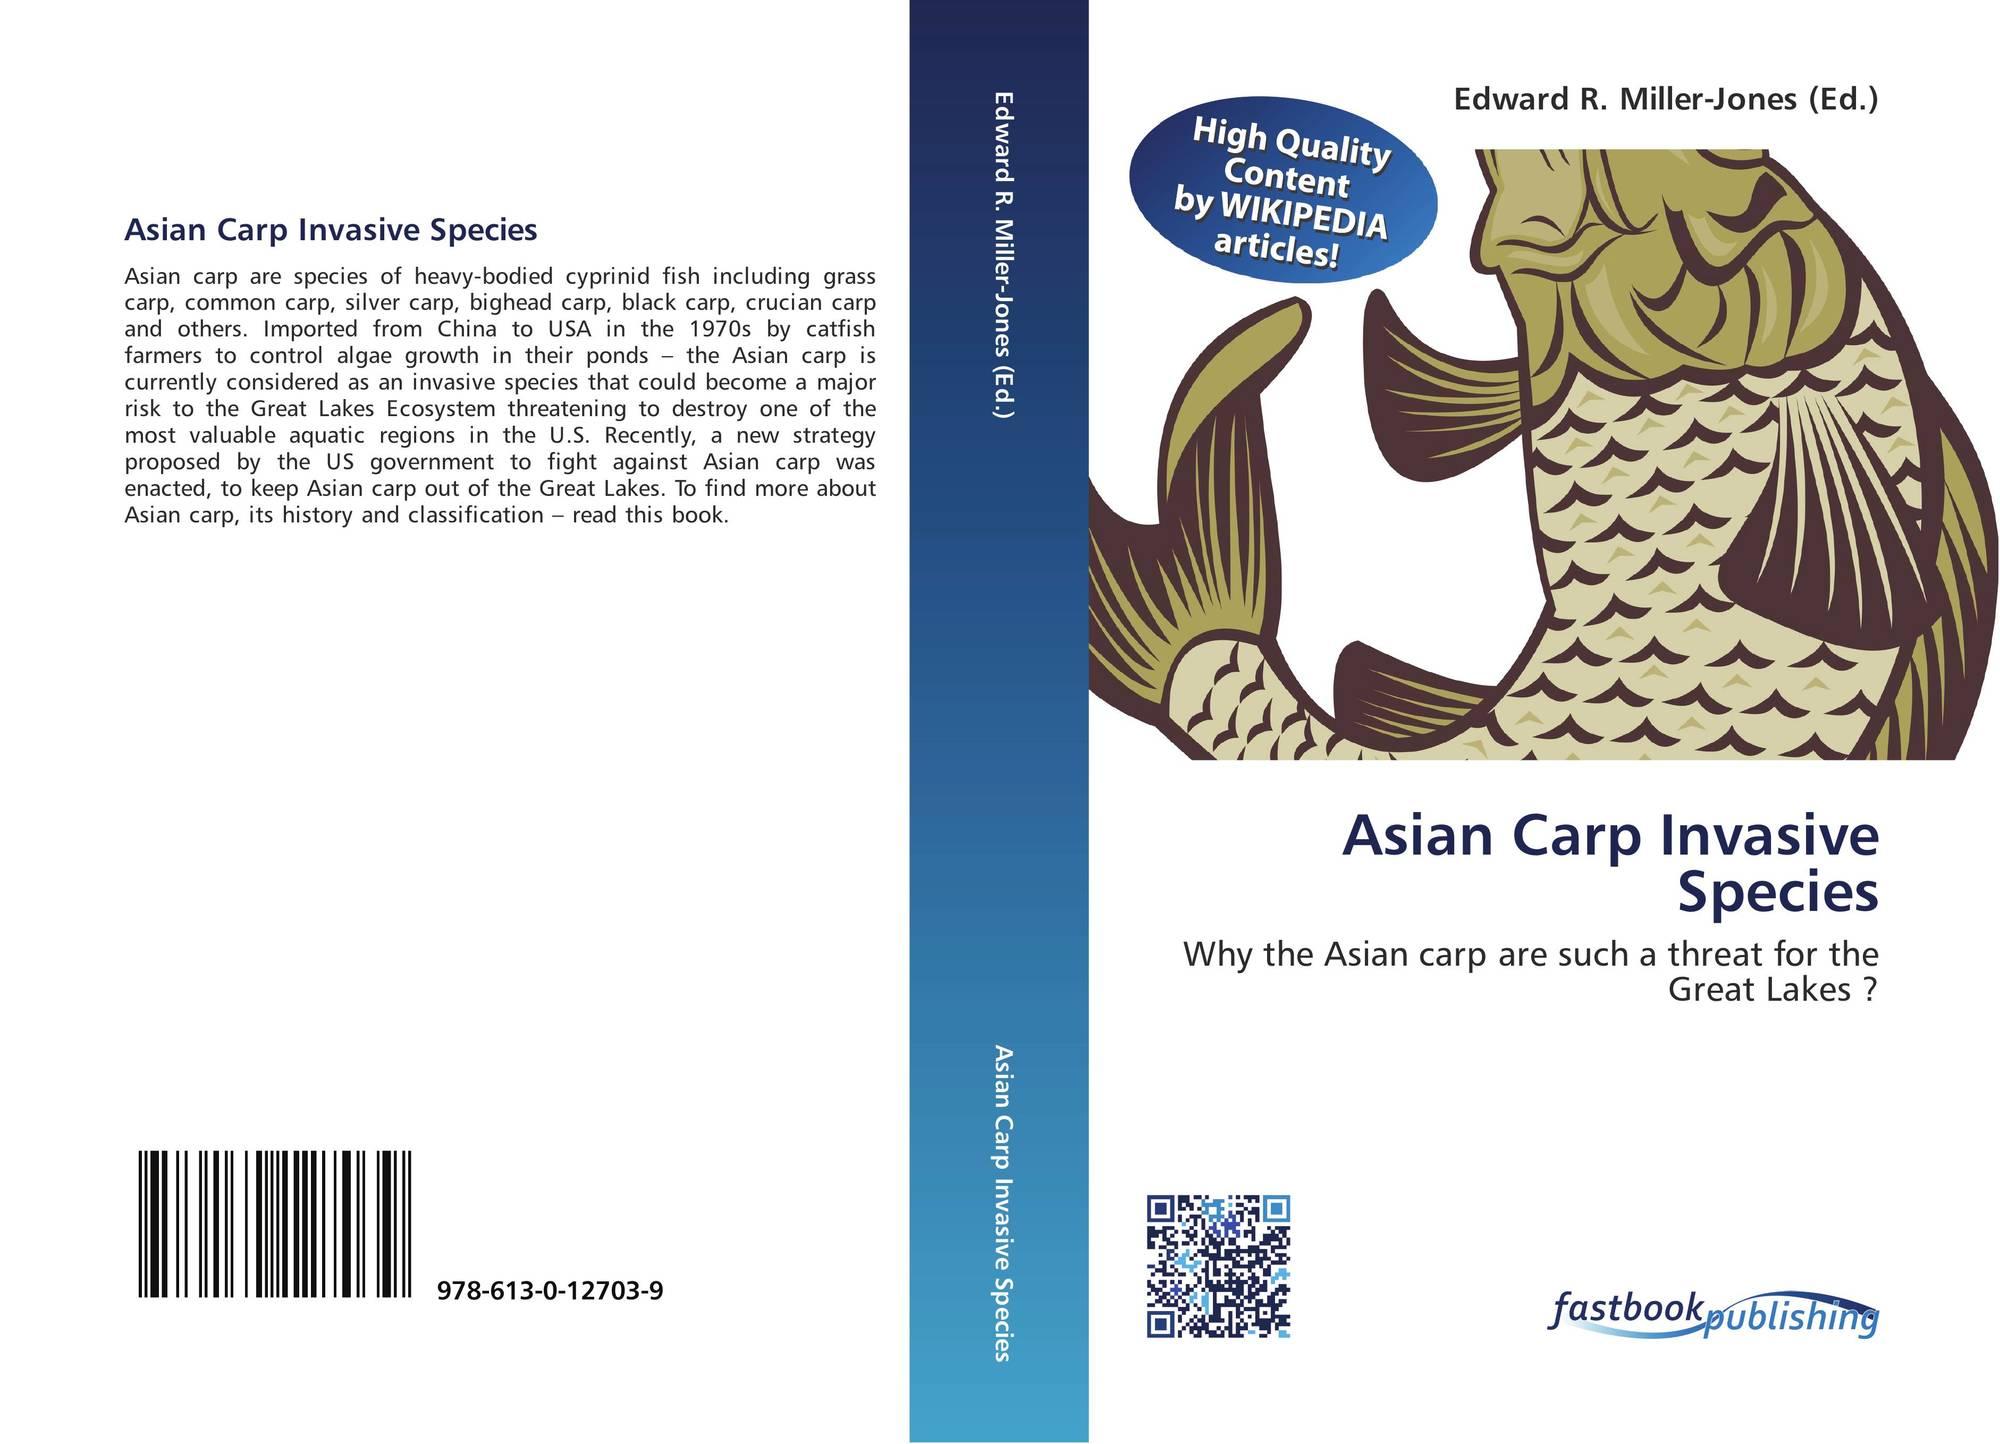 asian carps harm to the ecosystem essay